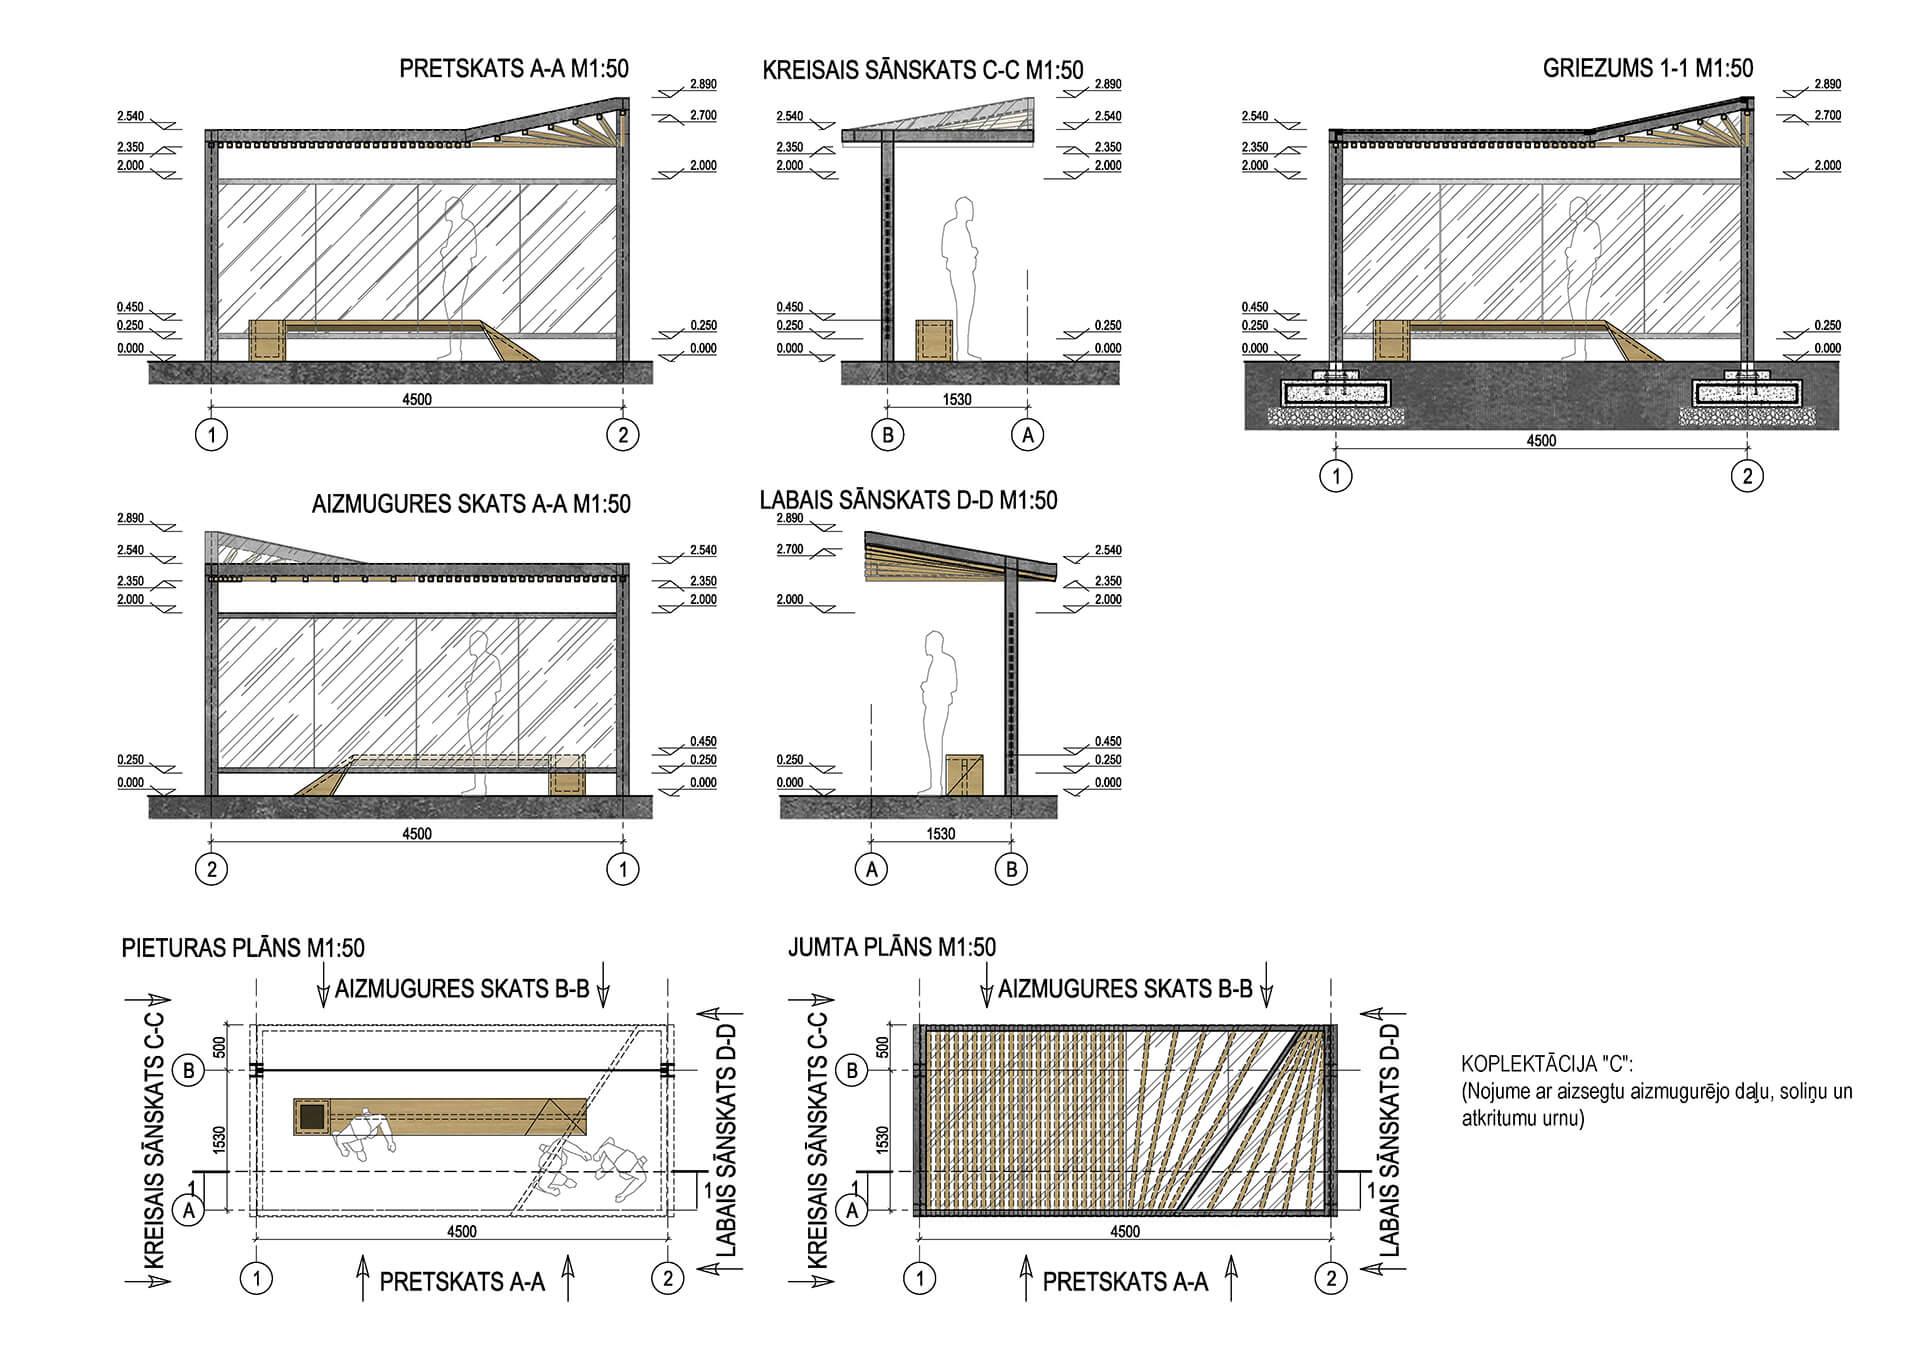 https://laagaarchitects.lv/wp-content/uploads/2019/11/03-06-14-JPD.jpg